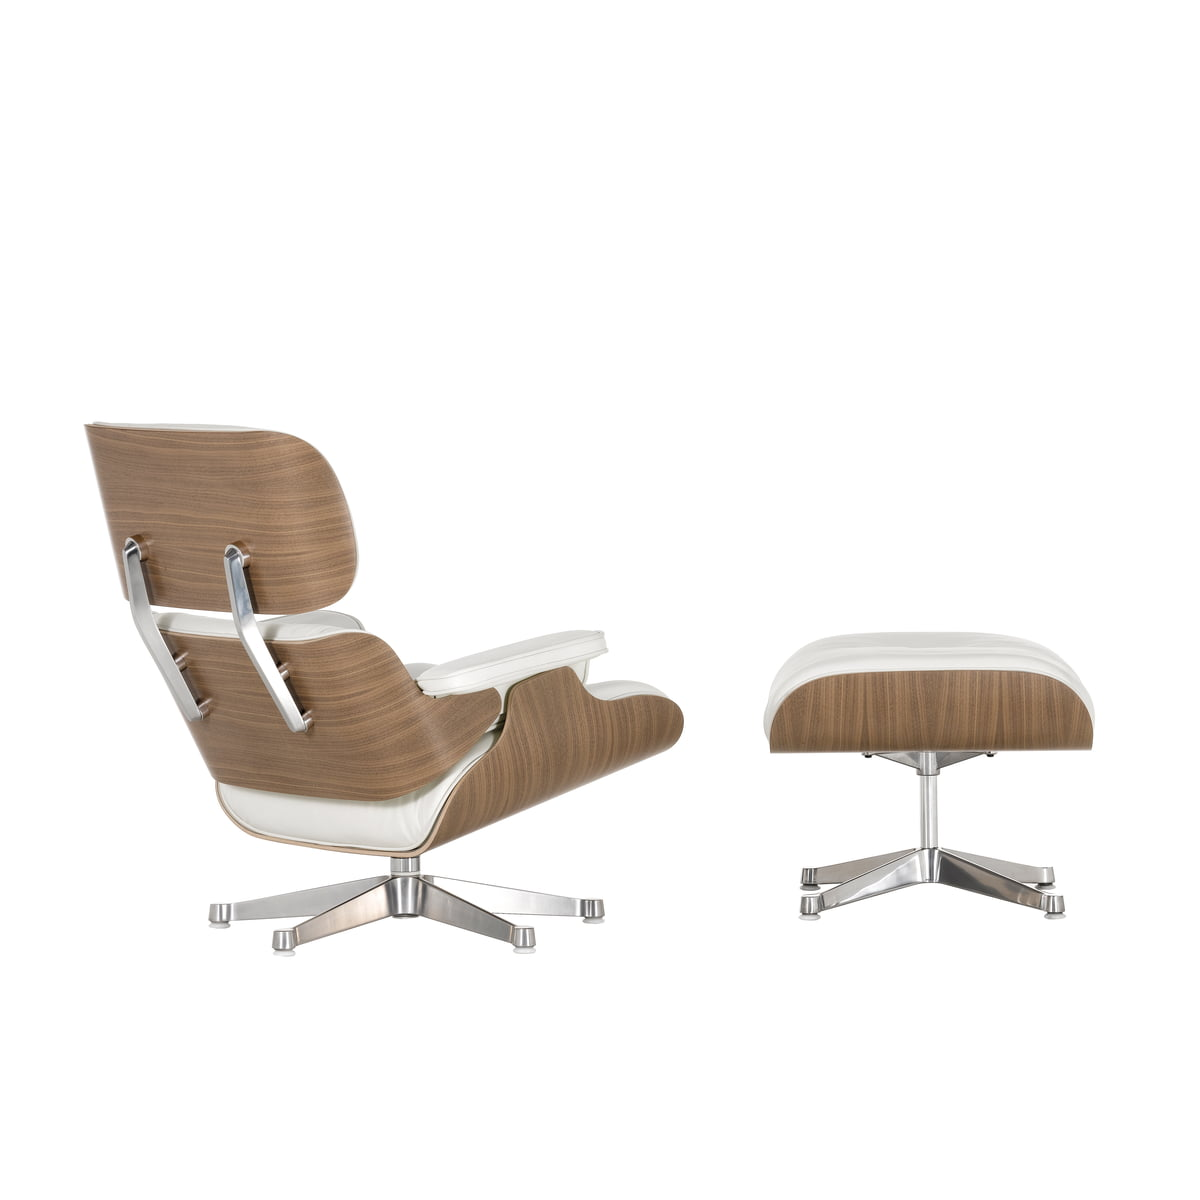 Vitra Eames Lounge Chair + Ottoman   Nussbaum, Weiss, Poliert